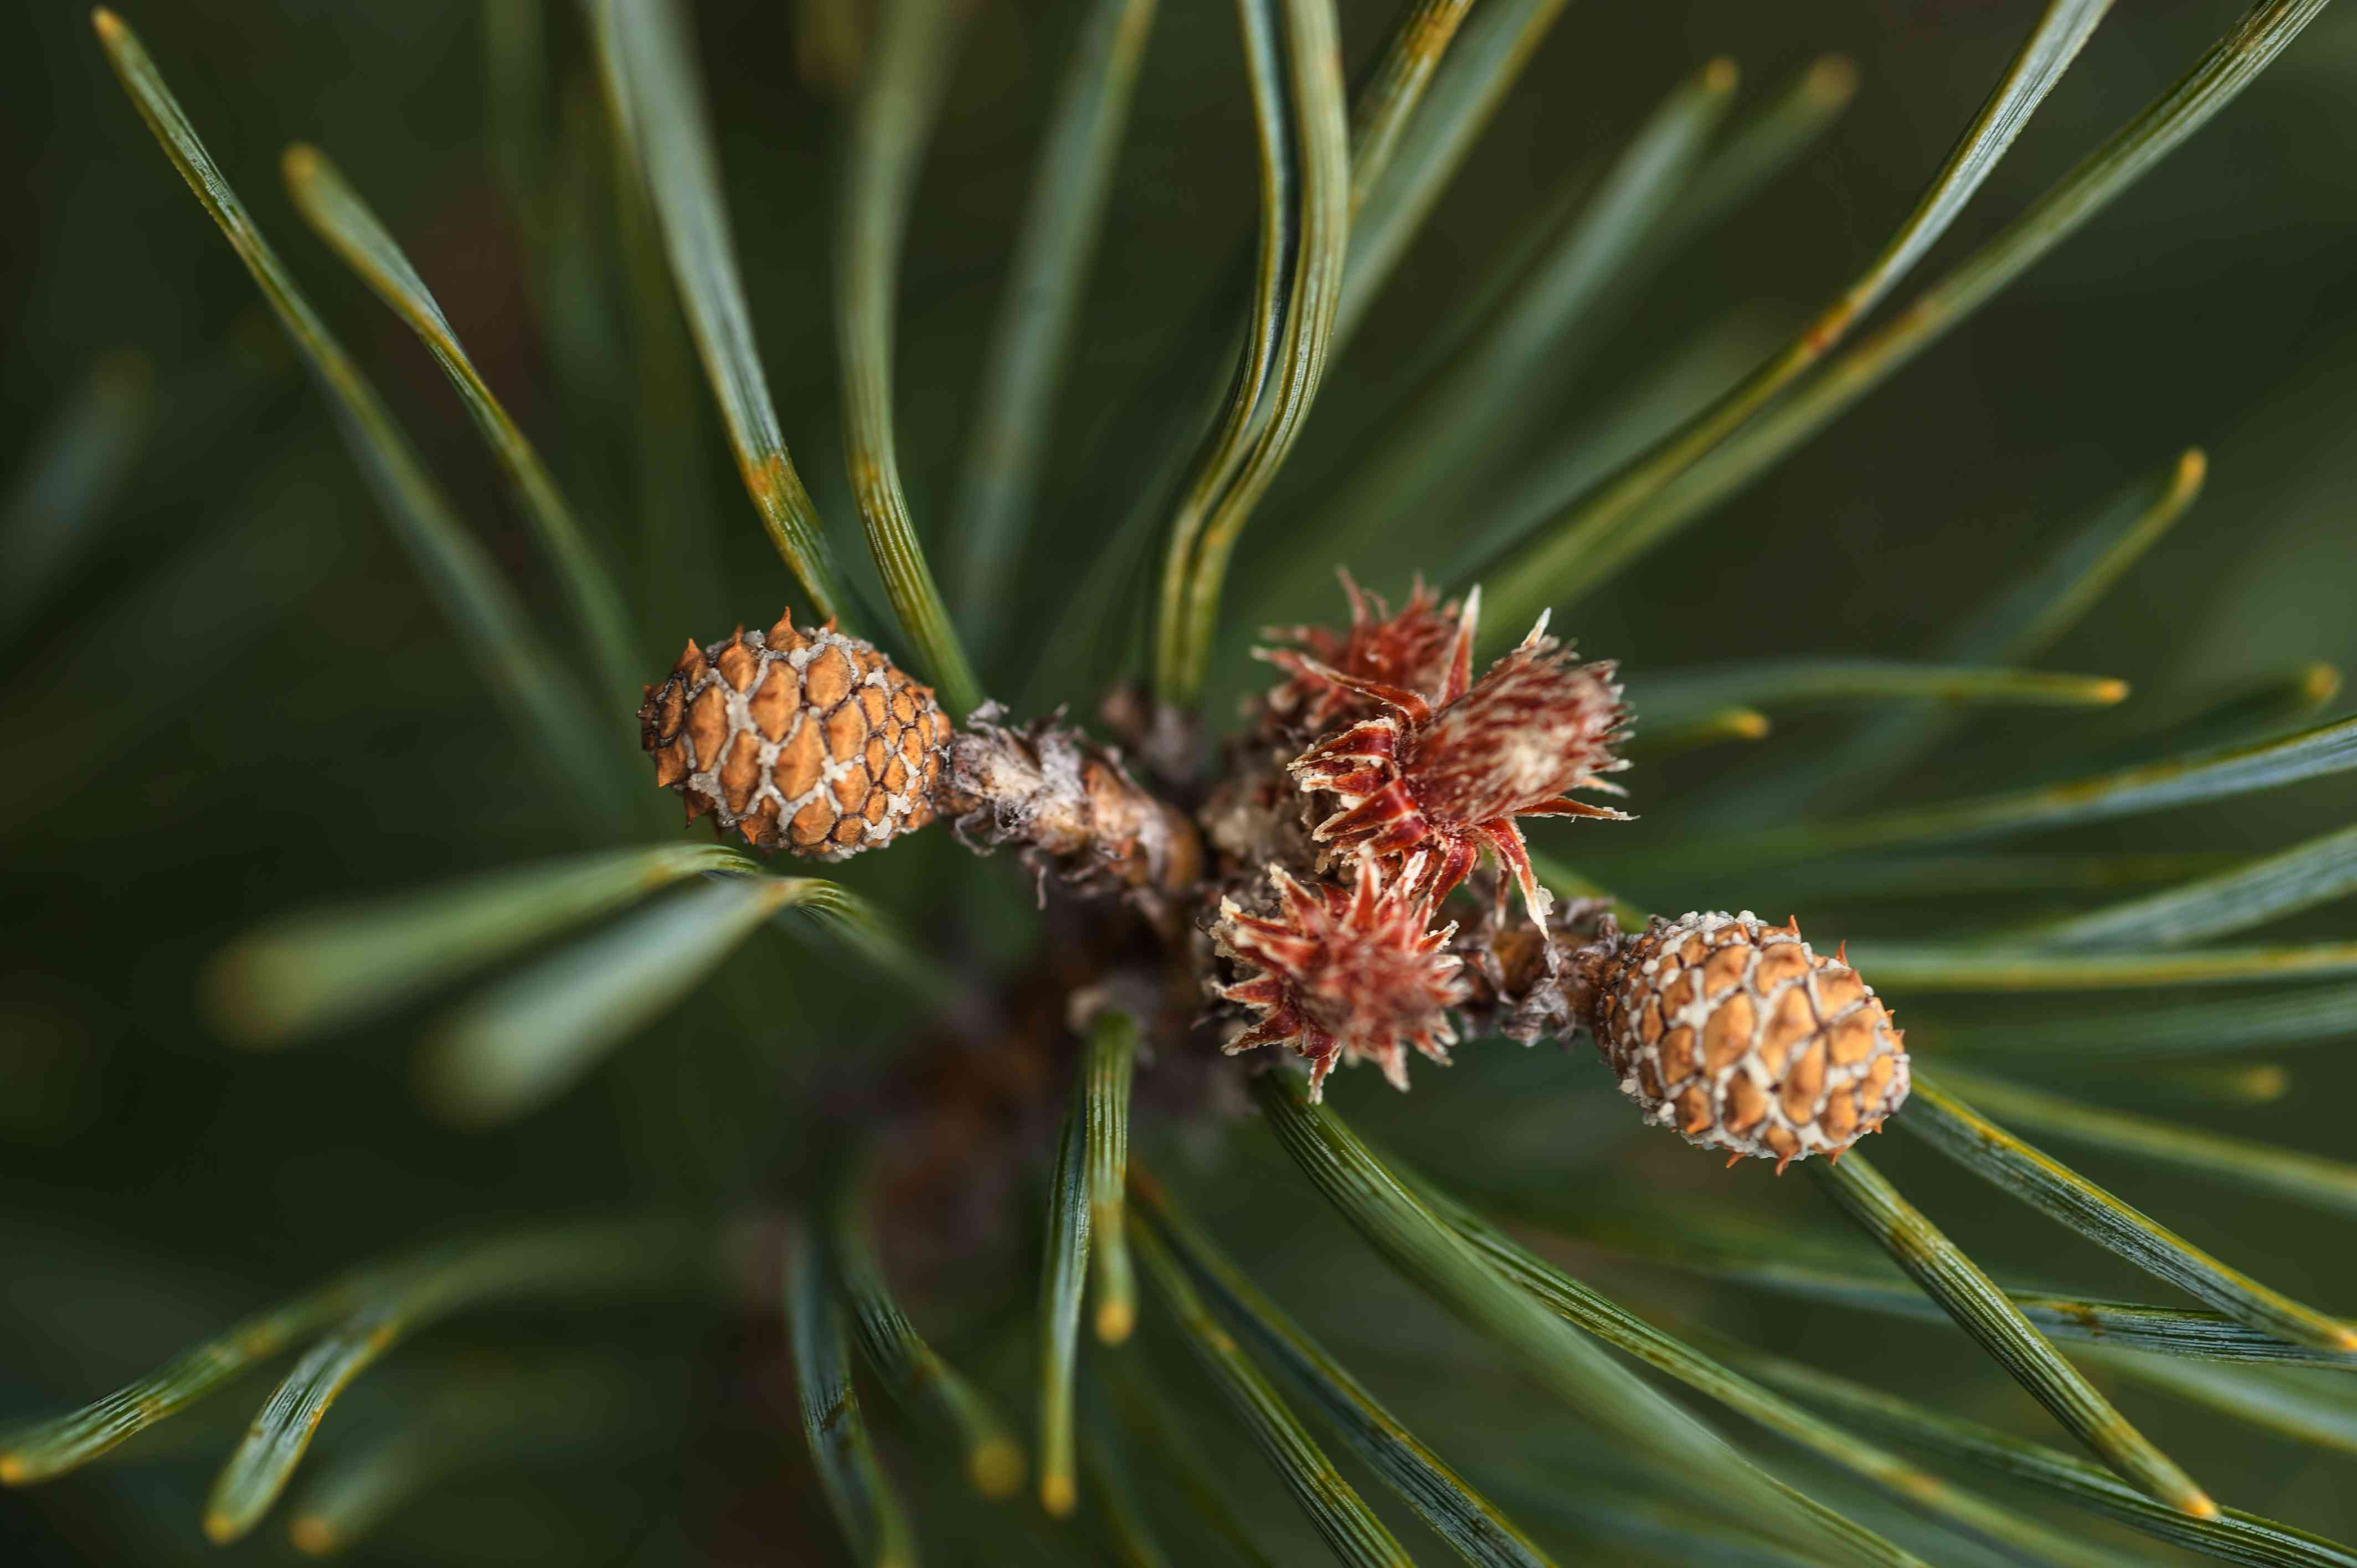 closeup of Scots pine